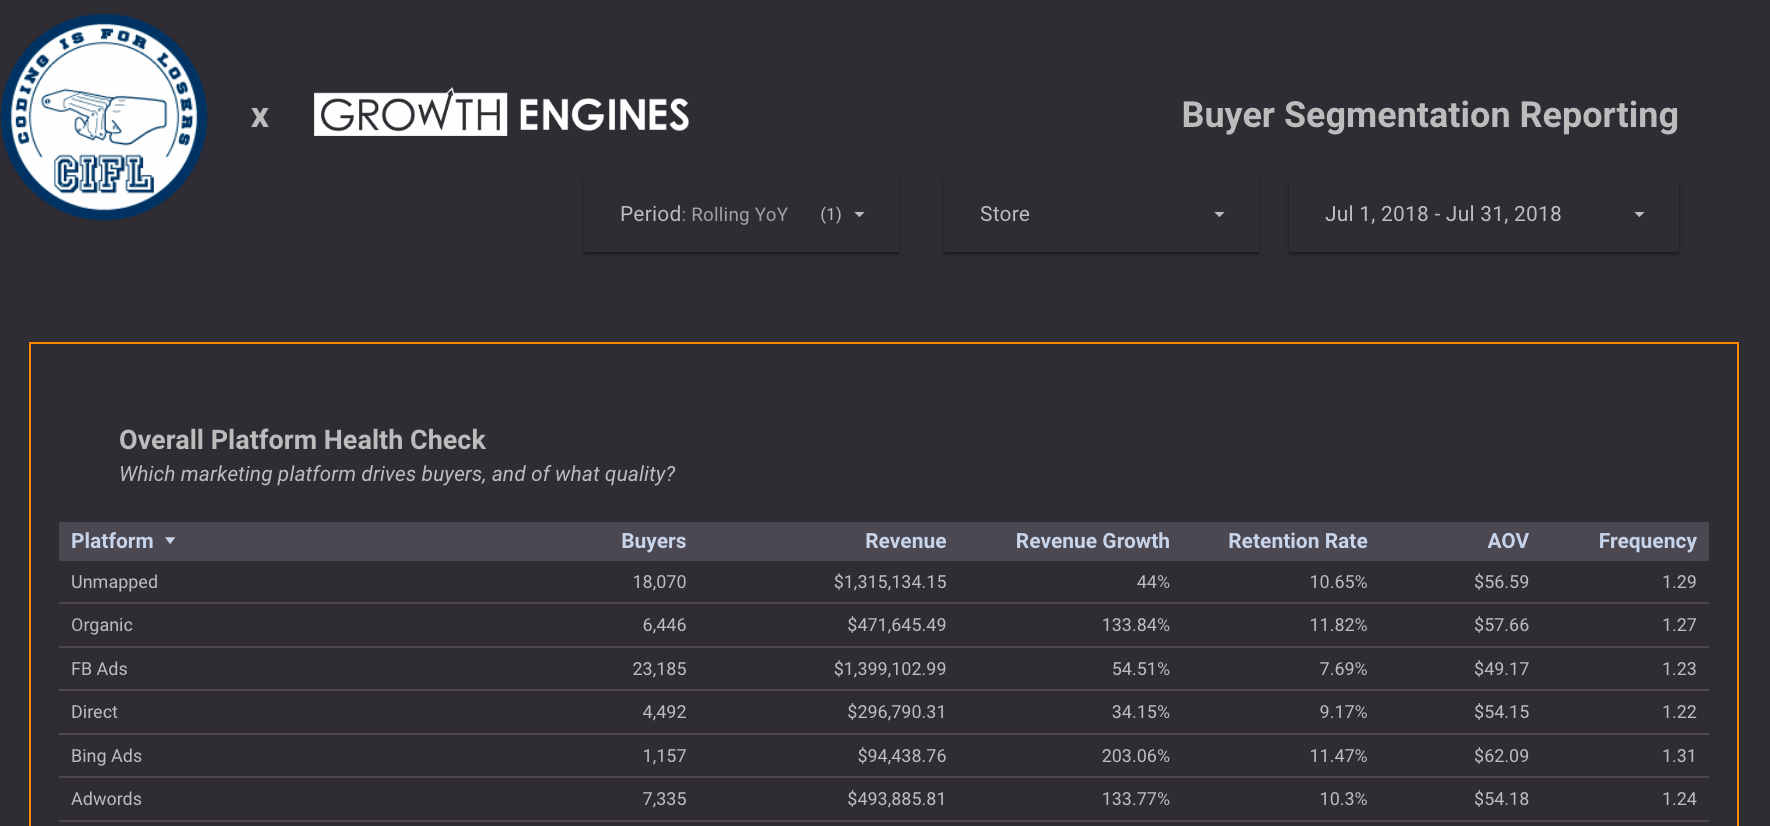 shopify data studio template